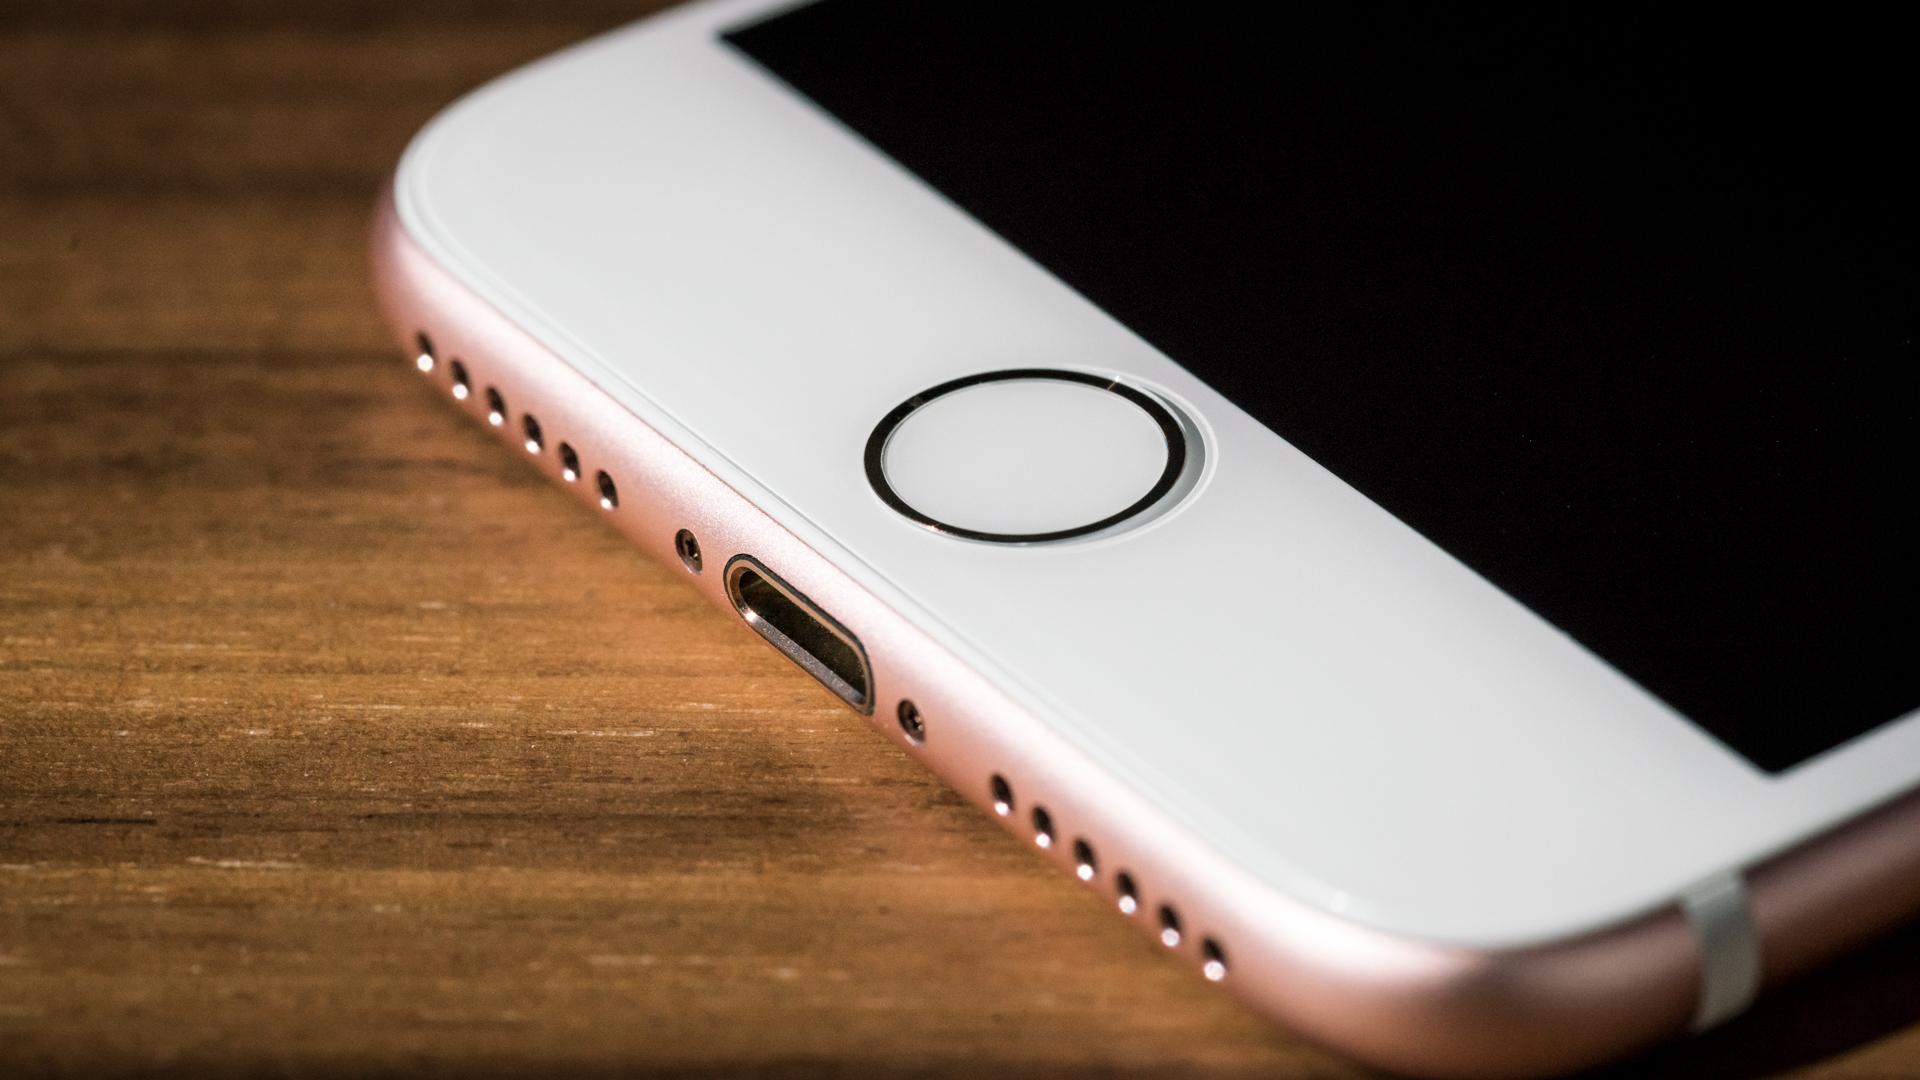 iphone7_review_adam_3_home-100683668-orig